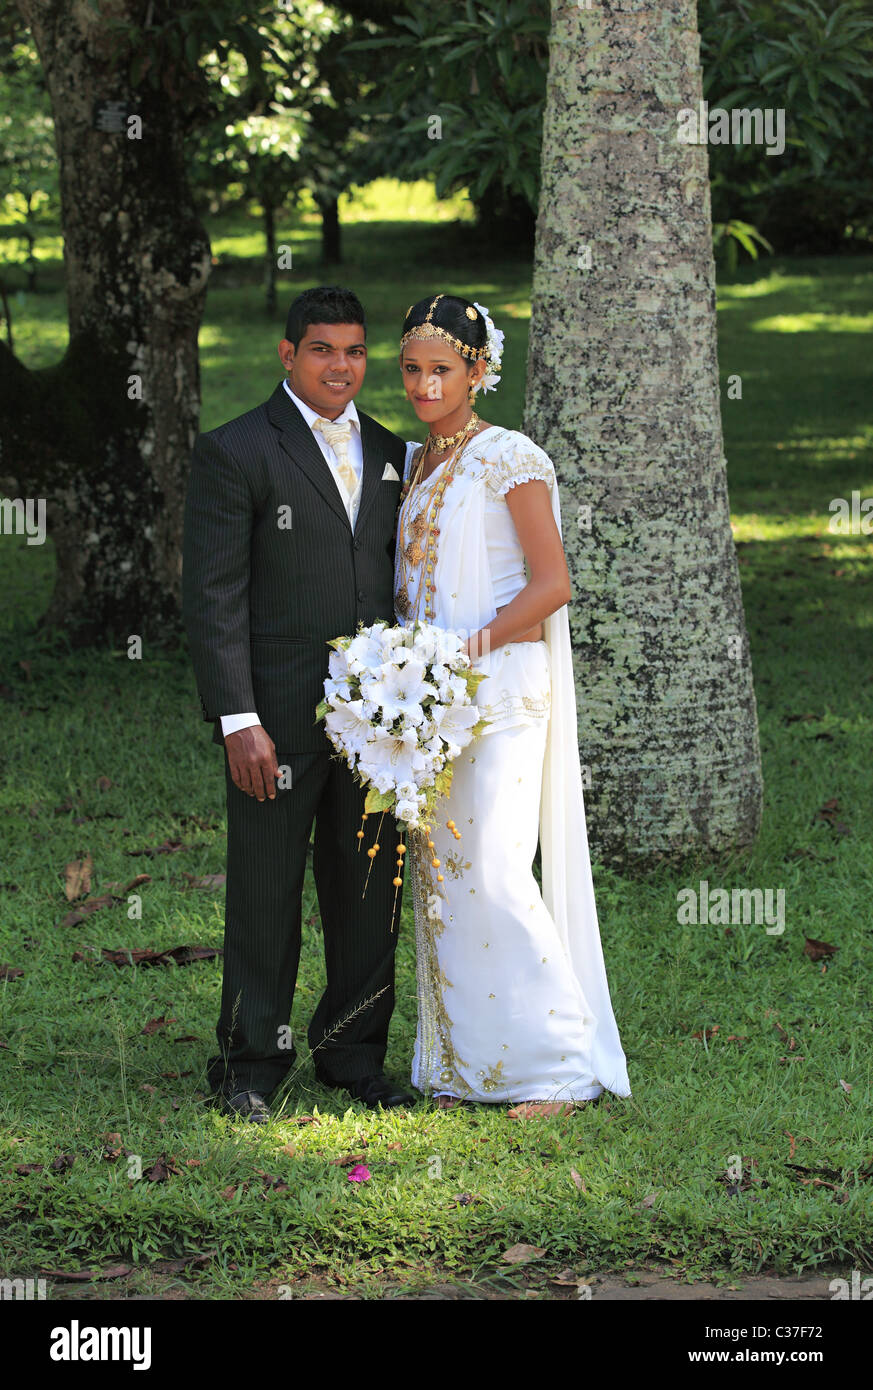 Wedding Ceremony With Traditional Dress In Sri Lanka Asia